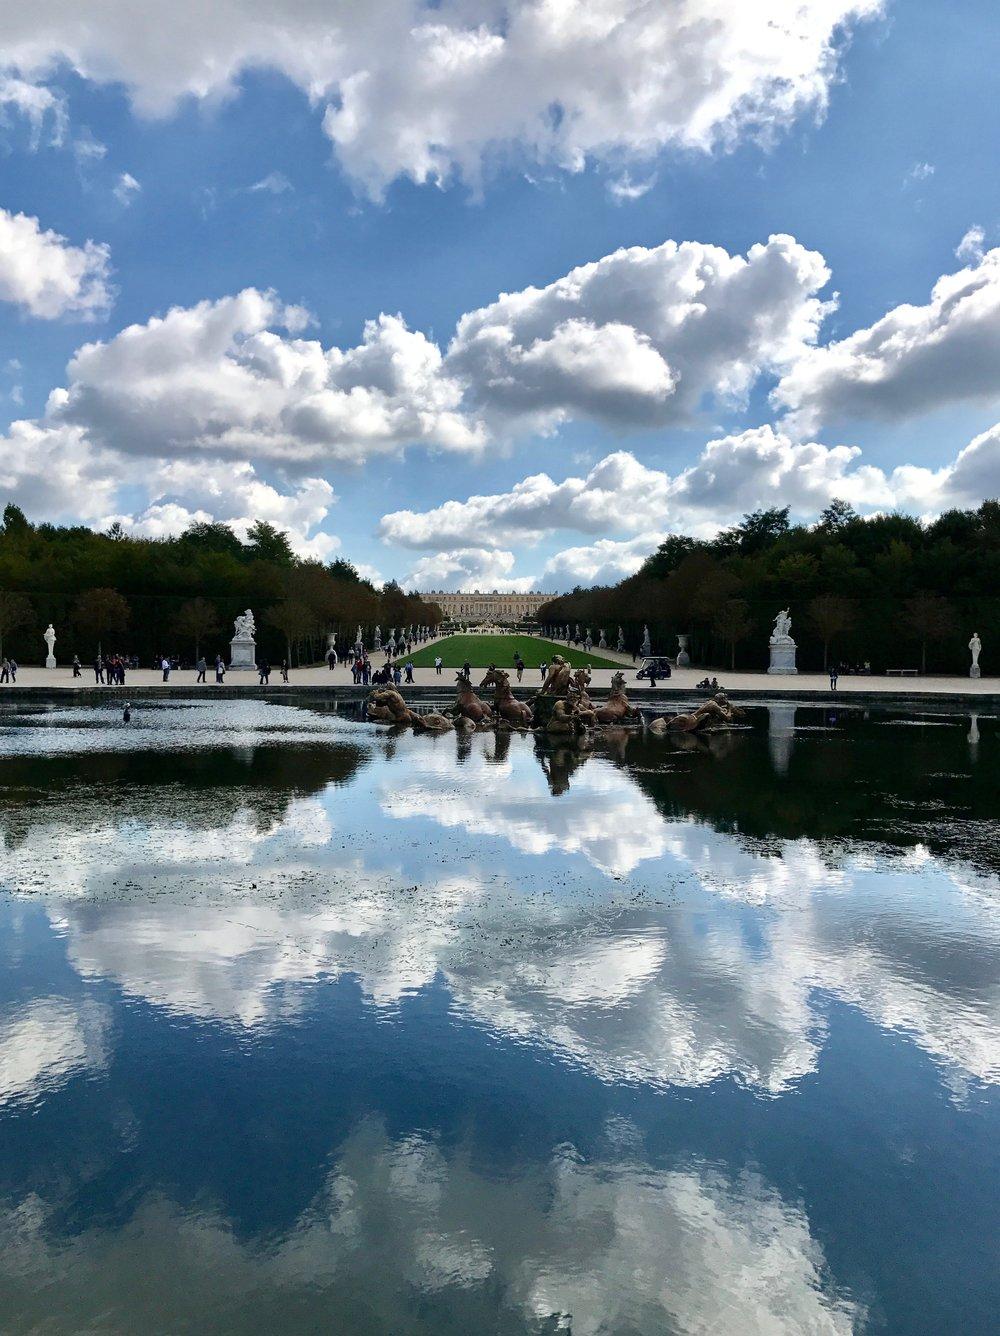 Apollo Fountain - Palace of Versailles